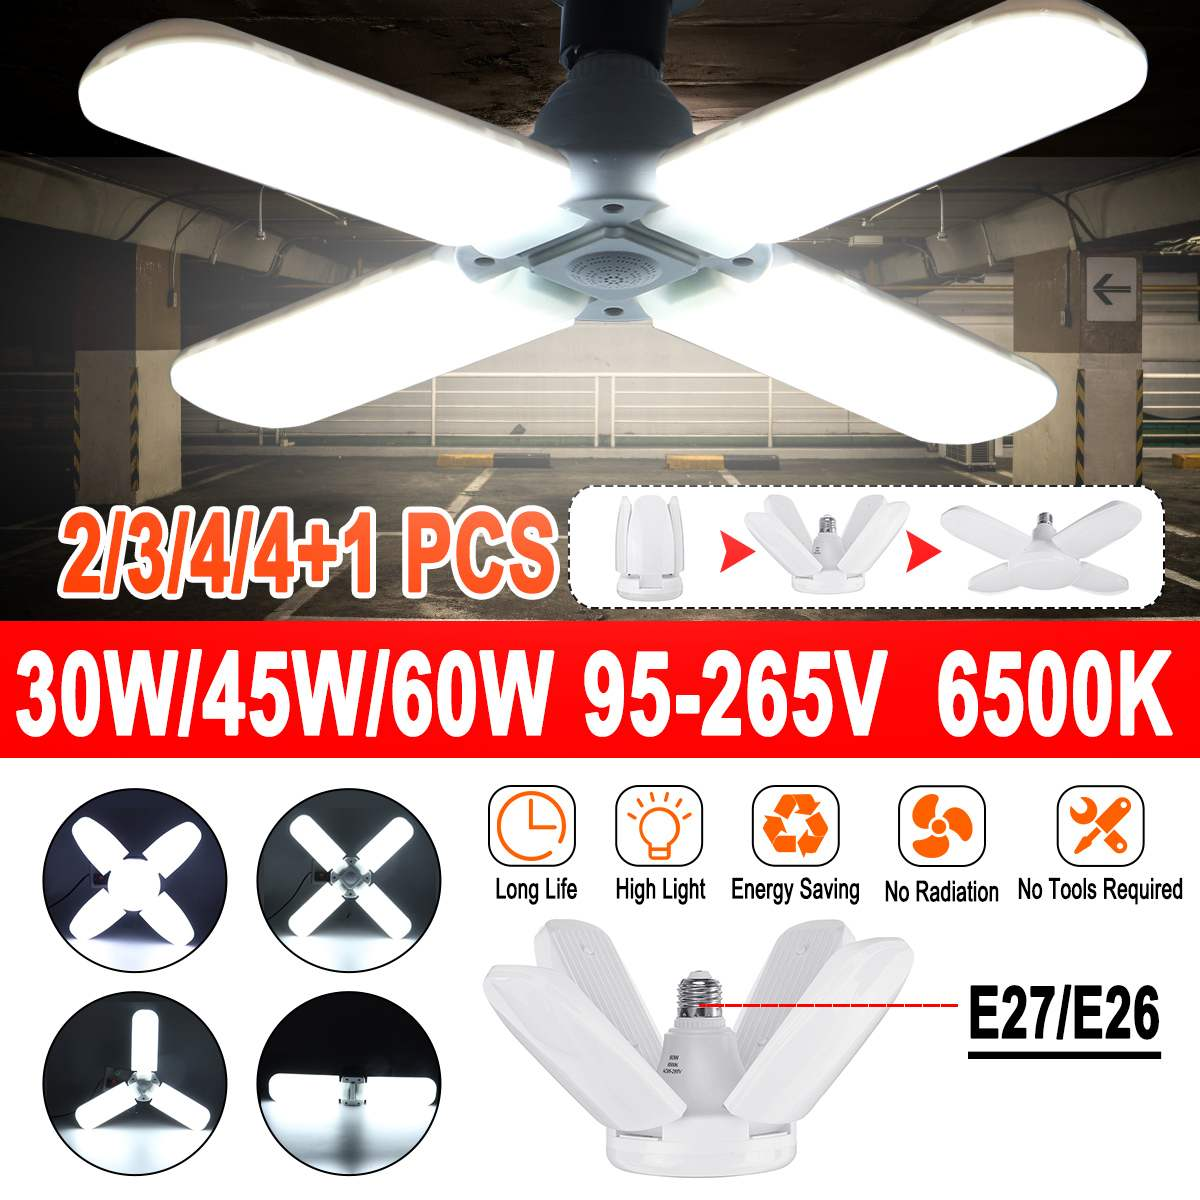 30W/45W/ 60W LED Garage Light E27/ E26 6500K Workshop Ceiling Lights Fixture Deformable Lamp Cold White Industrial Lighting